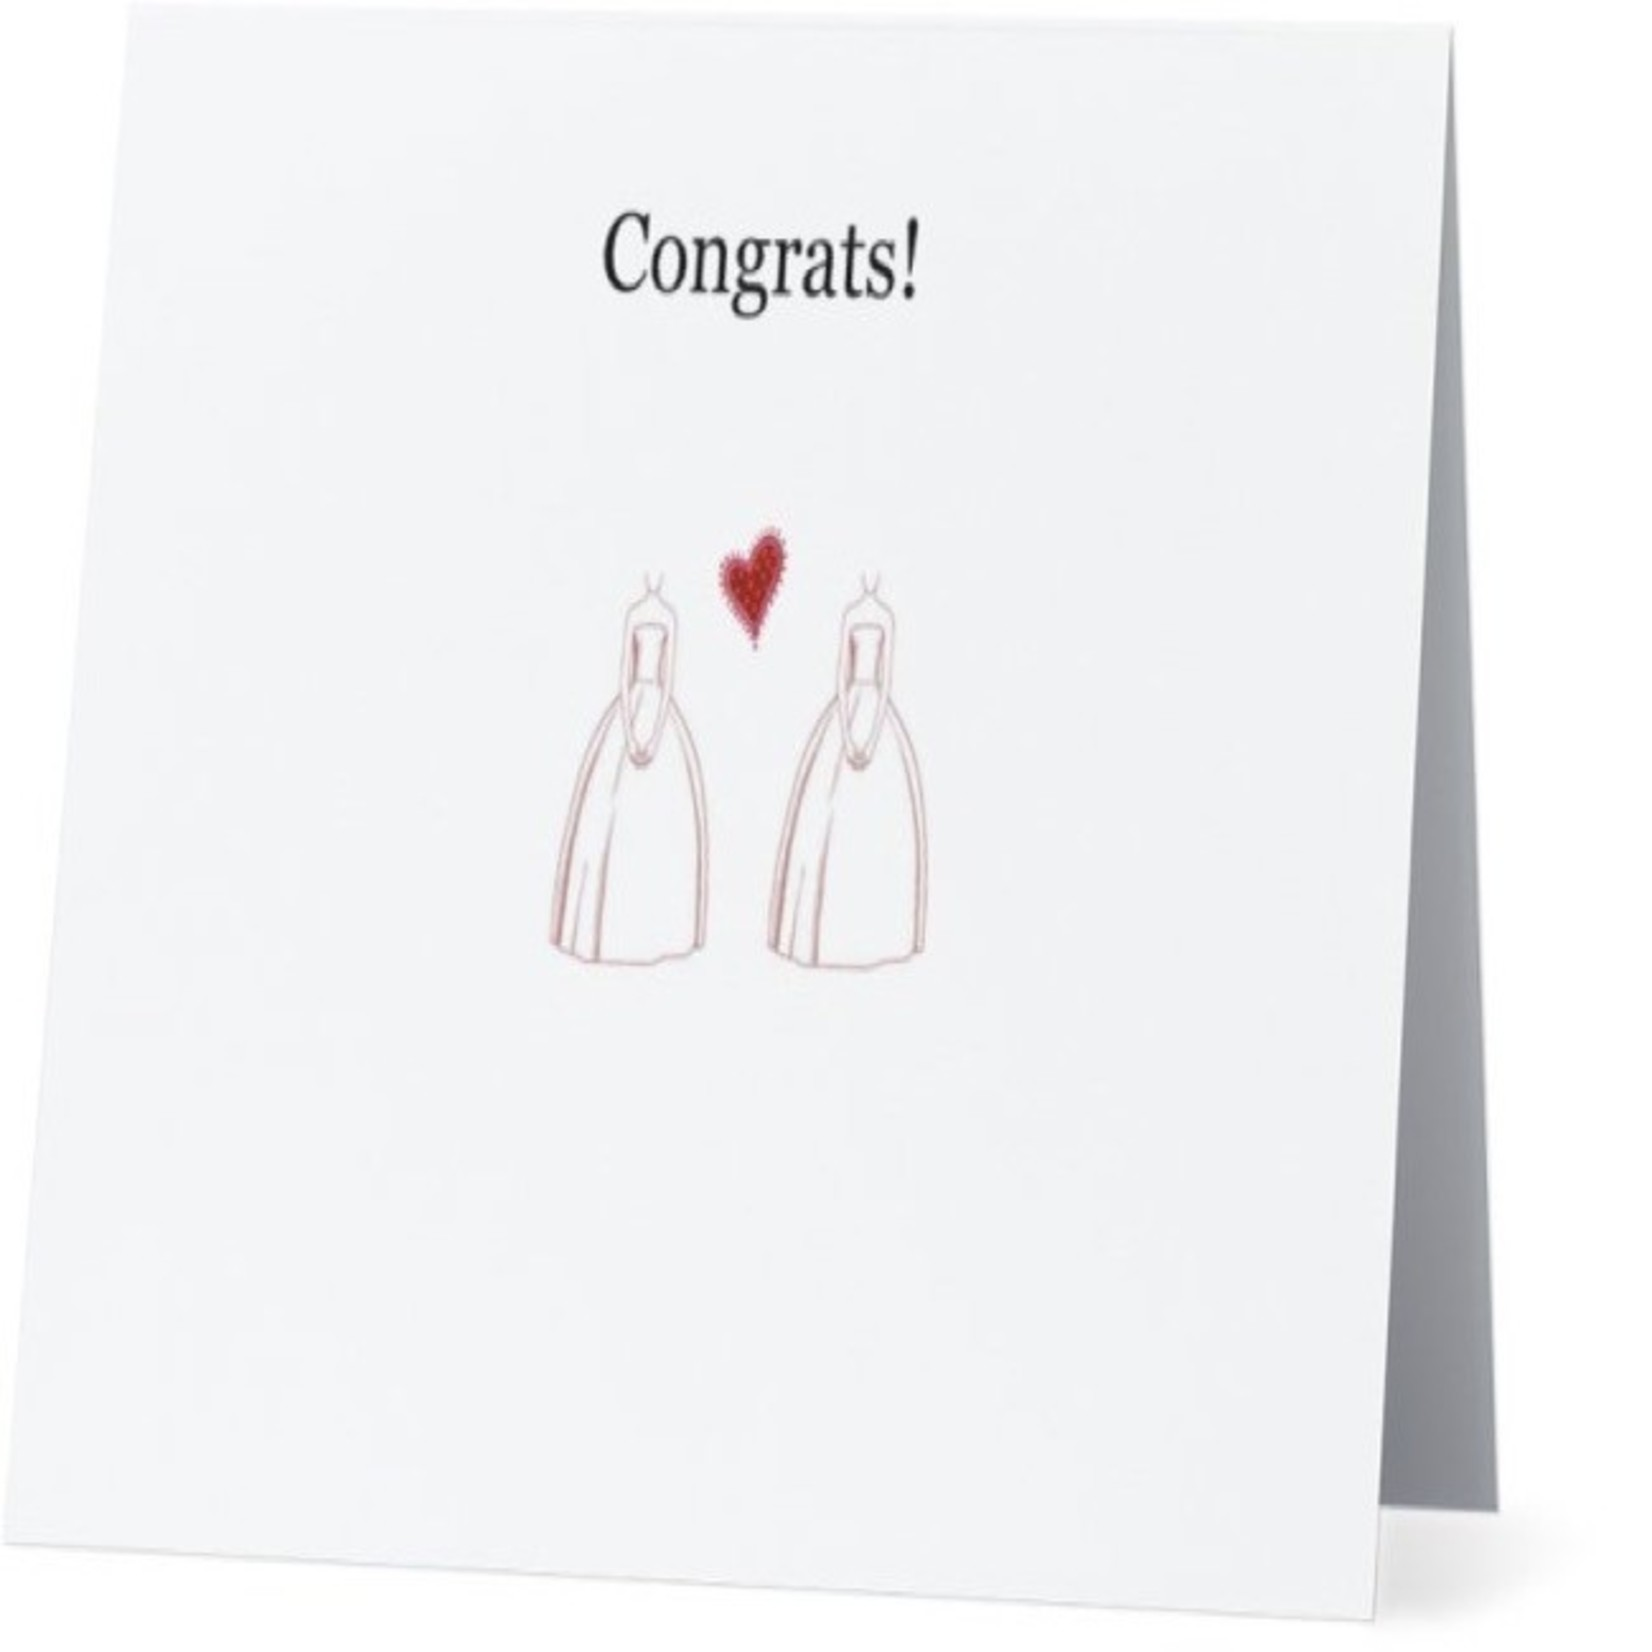 Bad Annie's Card #001 - Wedding Dresses (2 Gals)